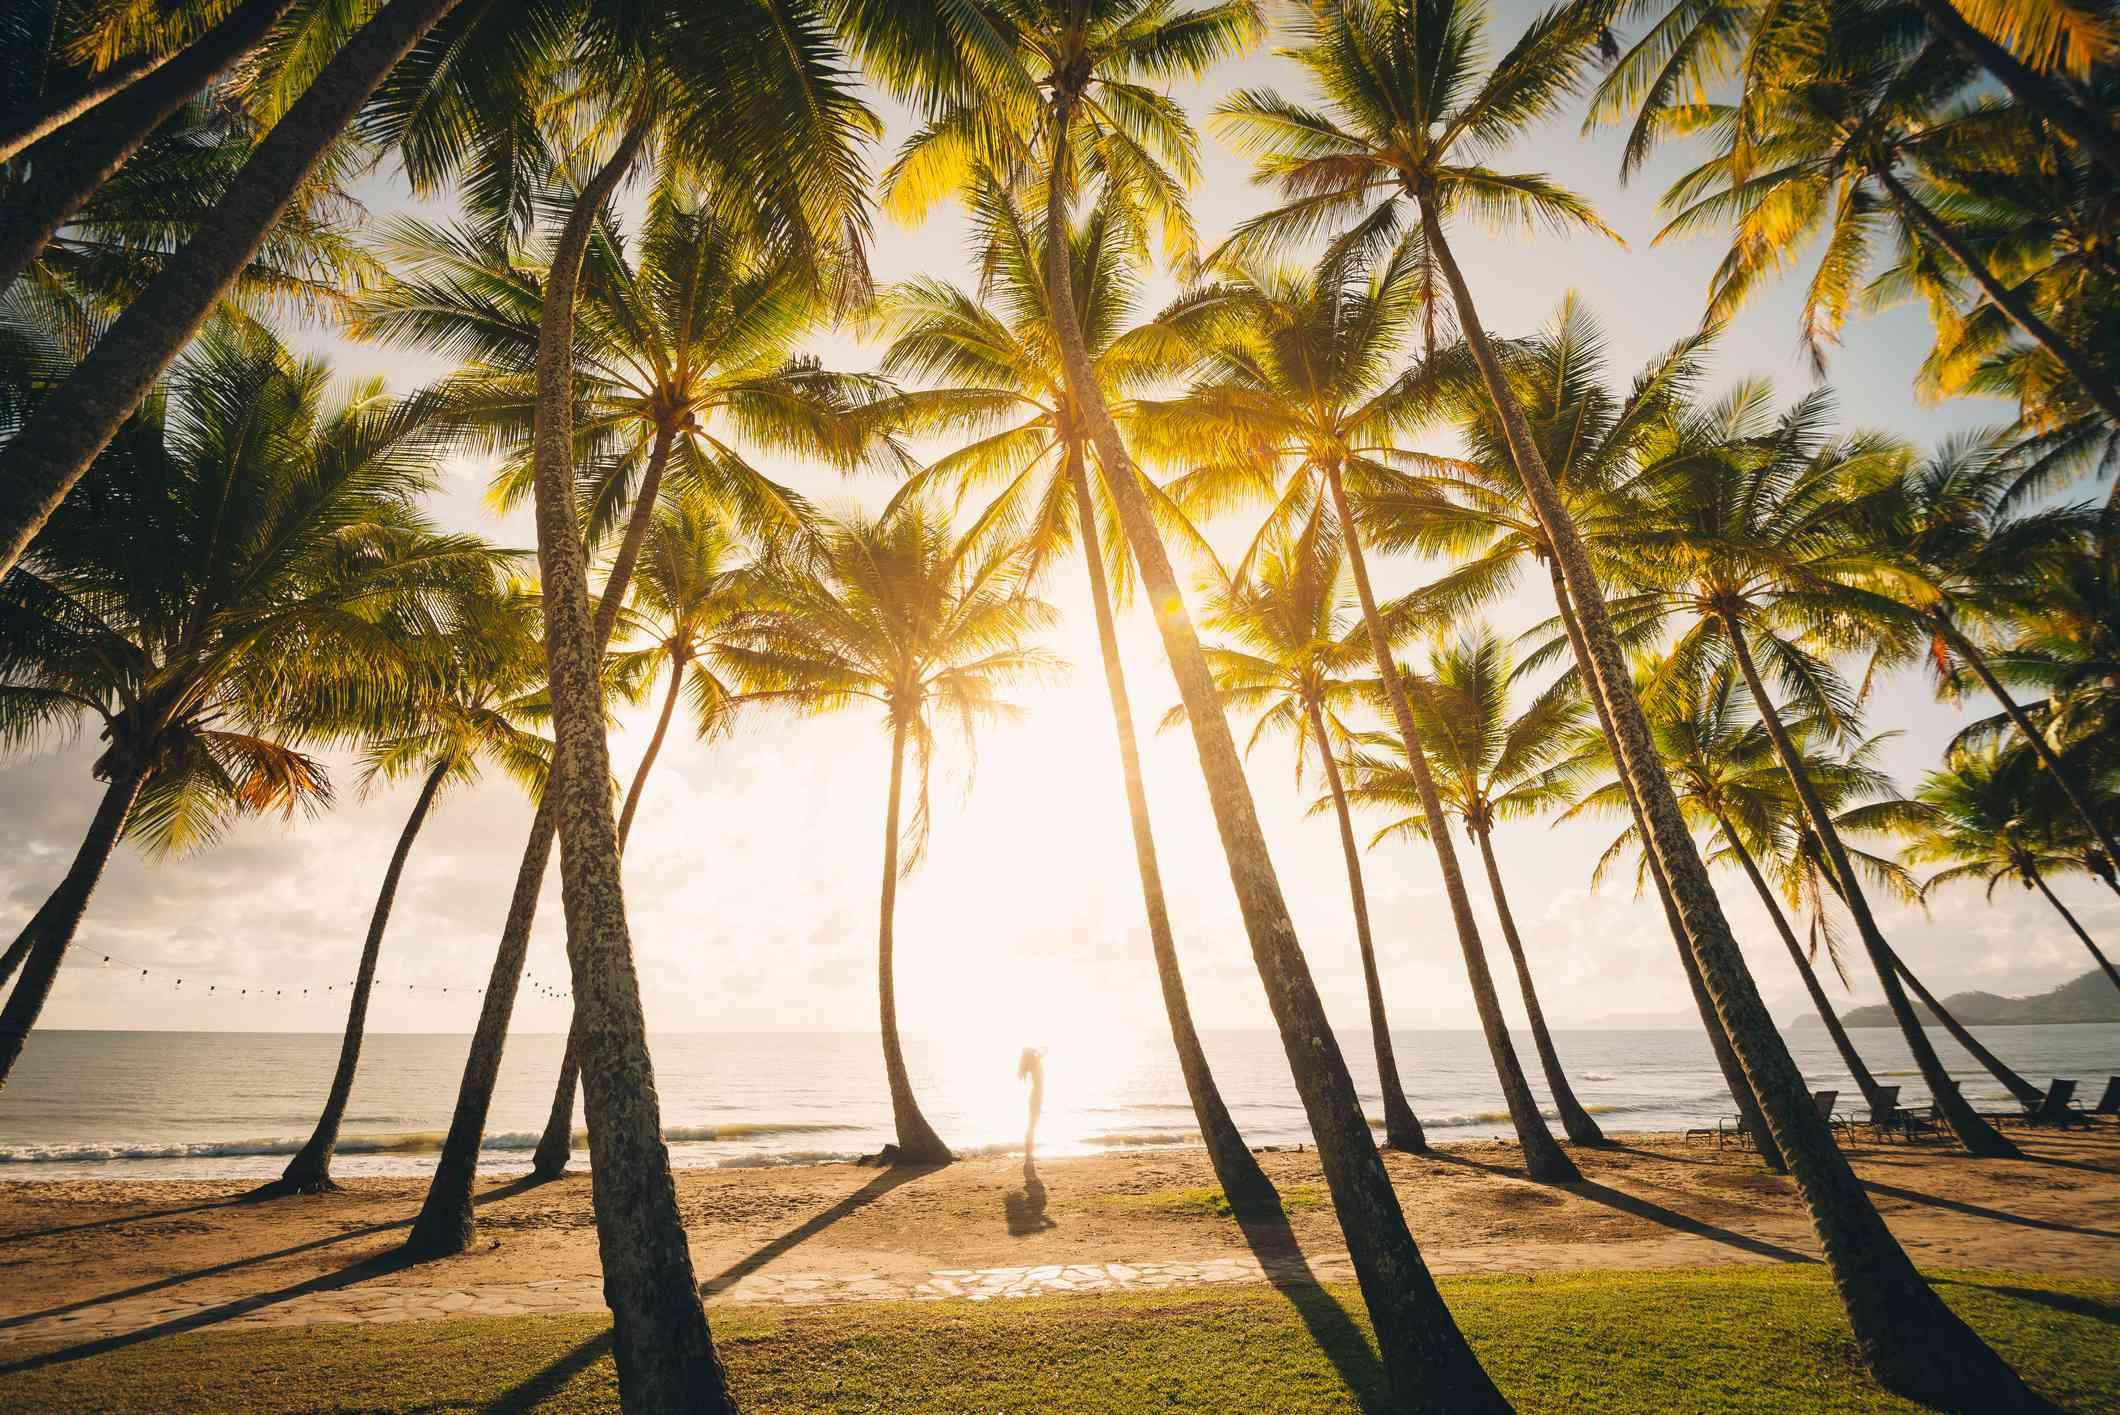 Sunrise through palm trees at Palm Cove